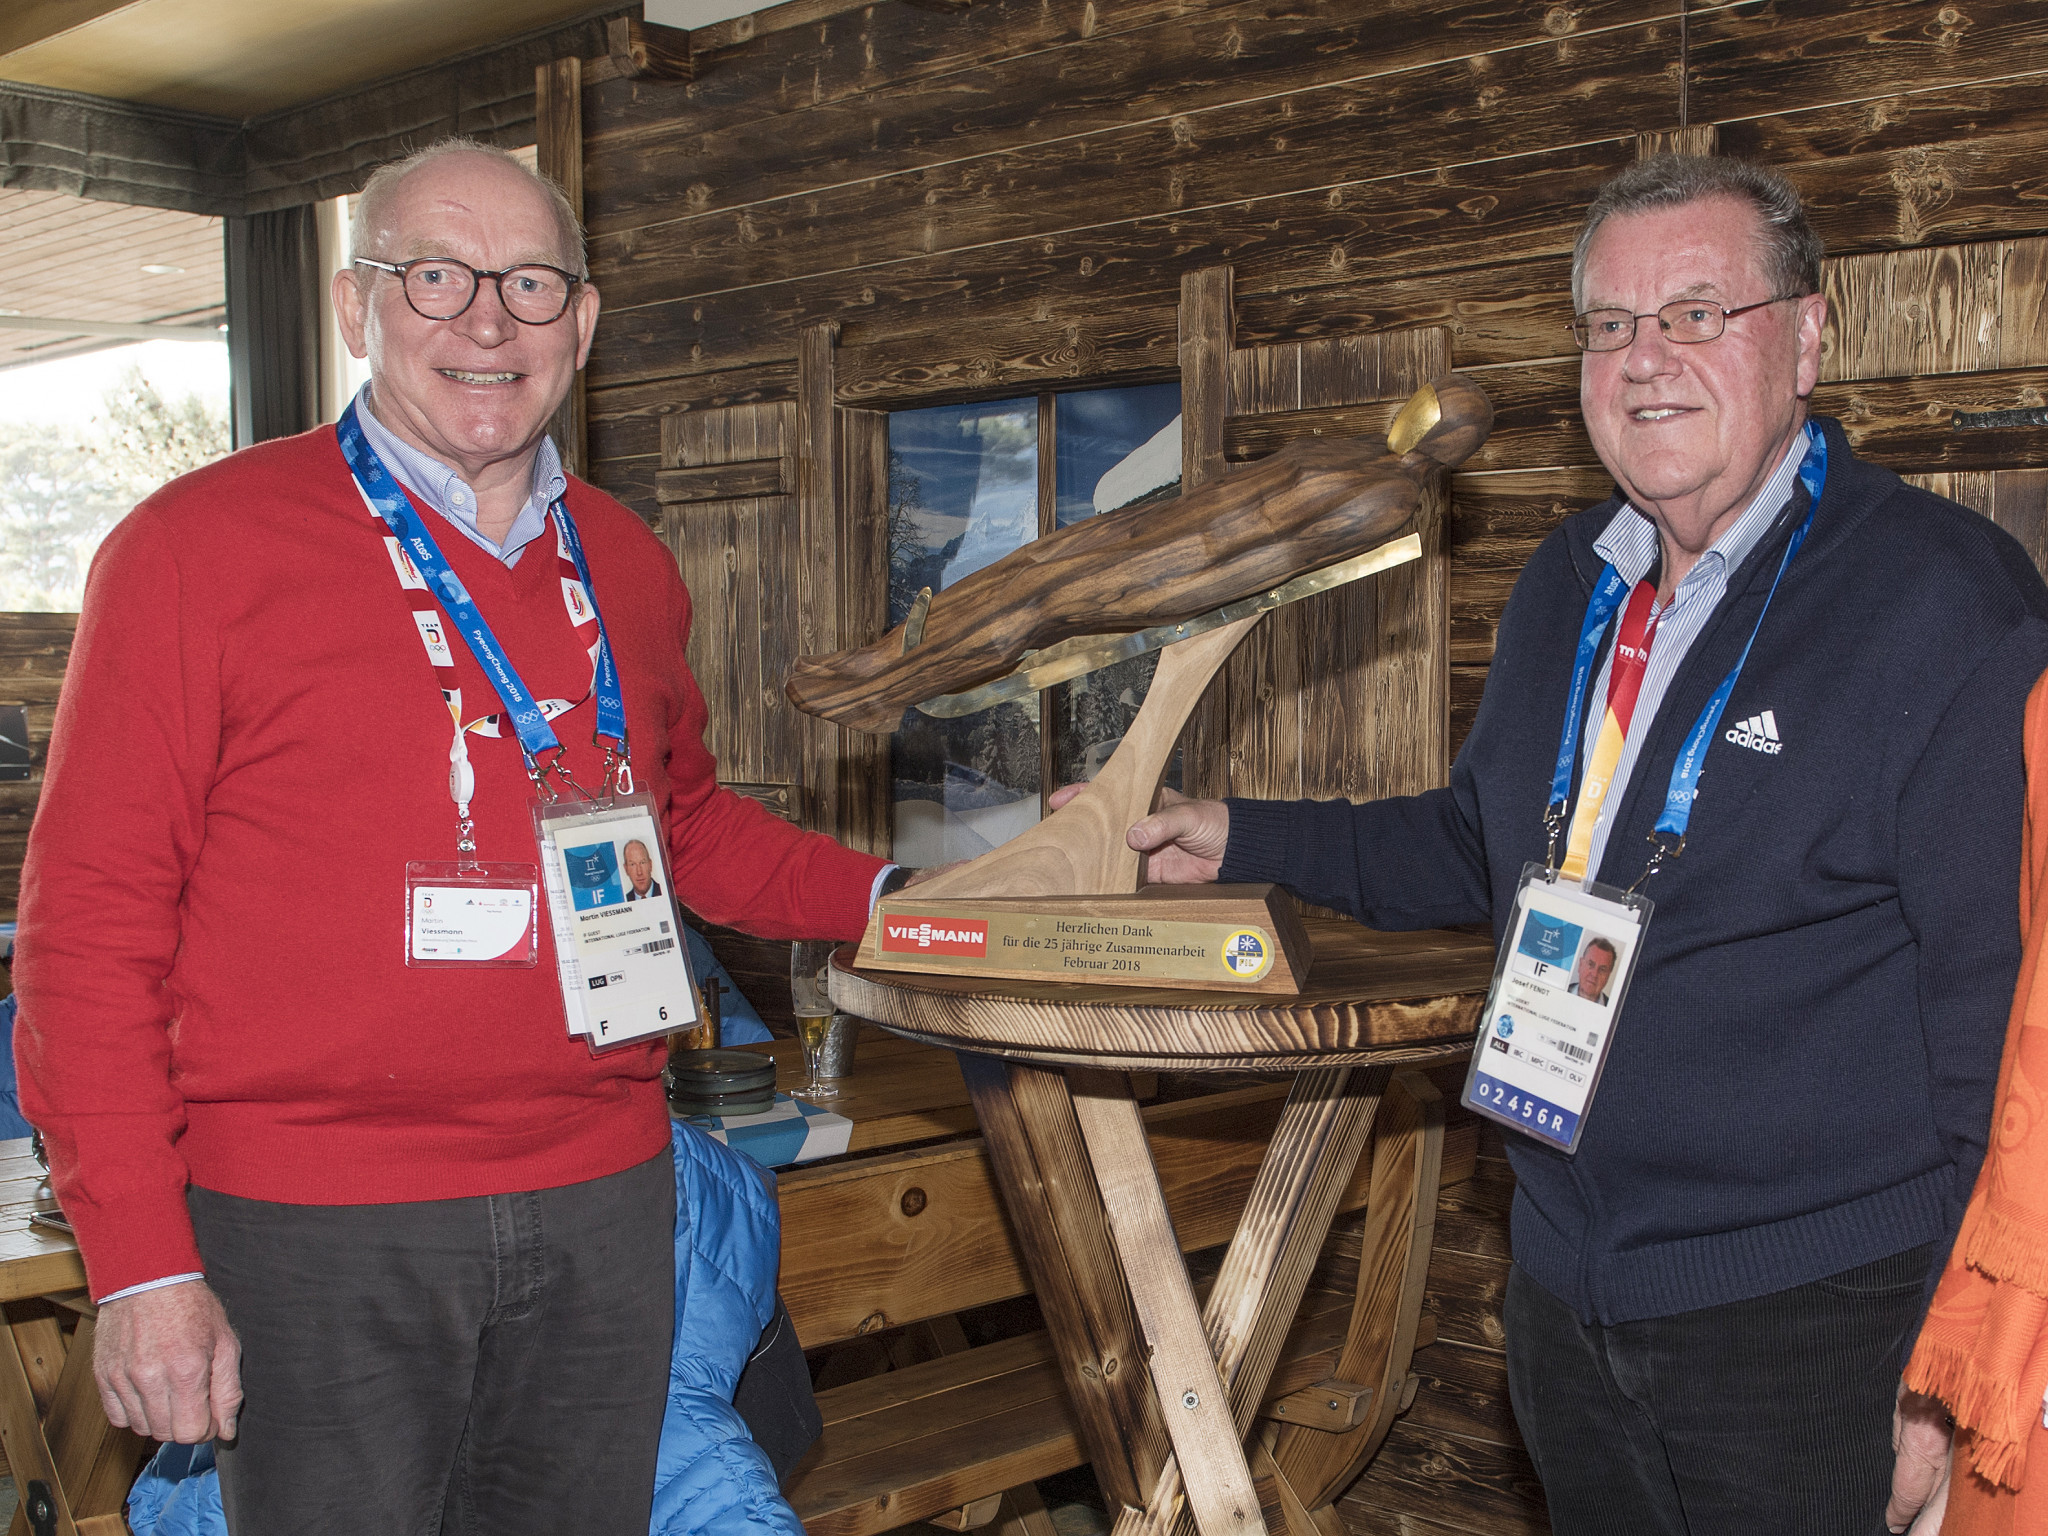 International Luge Federation marks 25-year anniversary of Viessmann partnership at Pyeongchang 2018